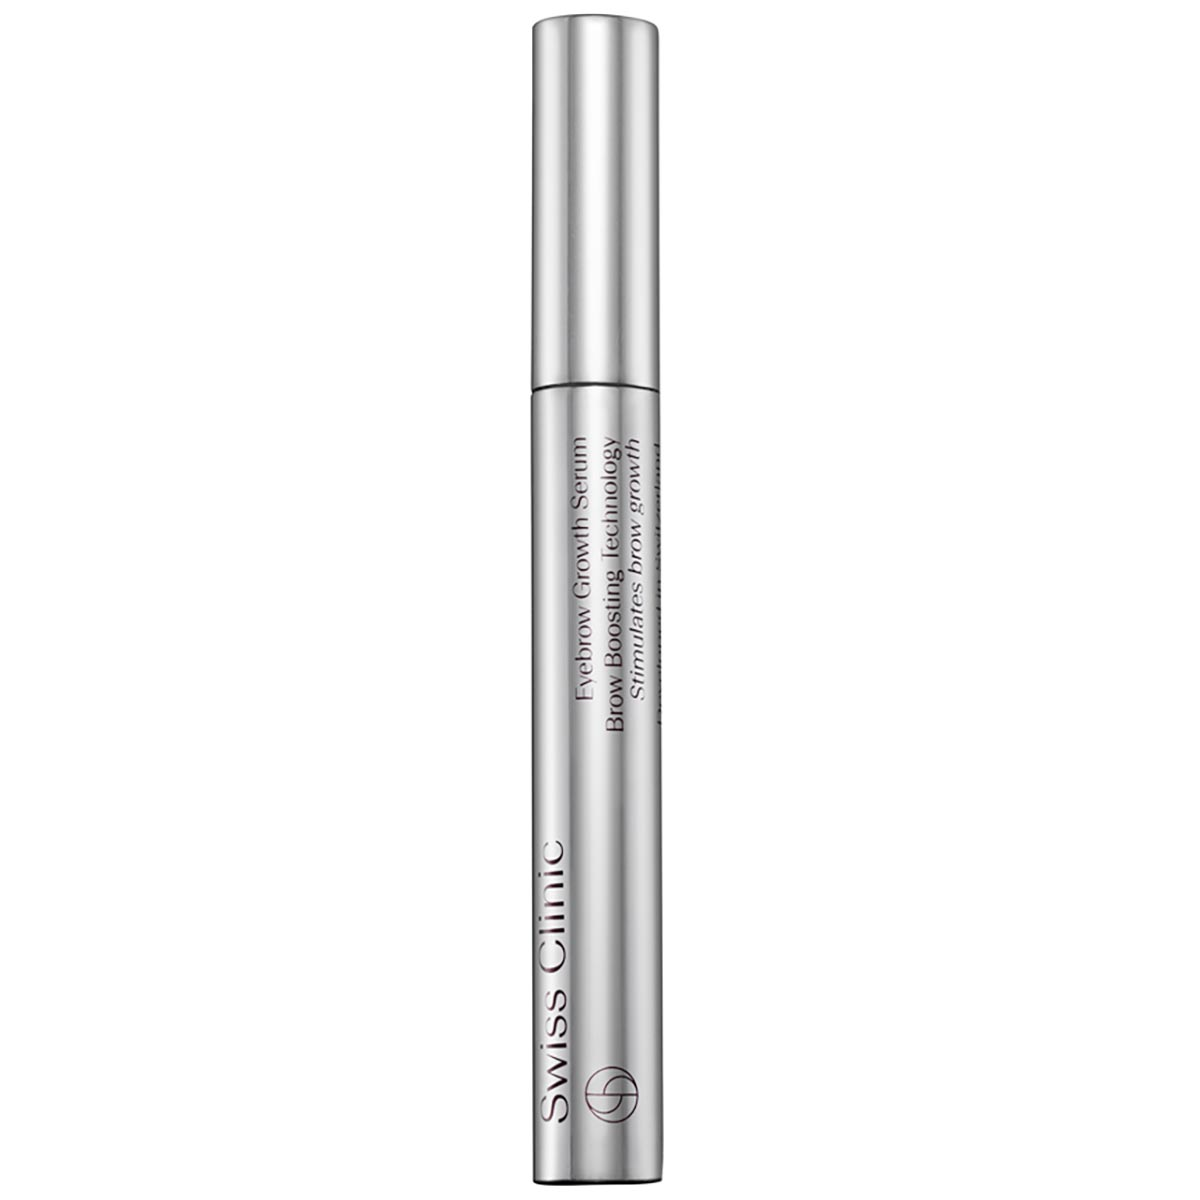 Eyebrow Enhancer, 6 ml Swiss Clinic Ögonbrynsmakeup